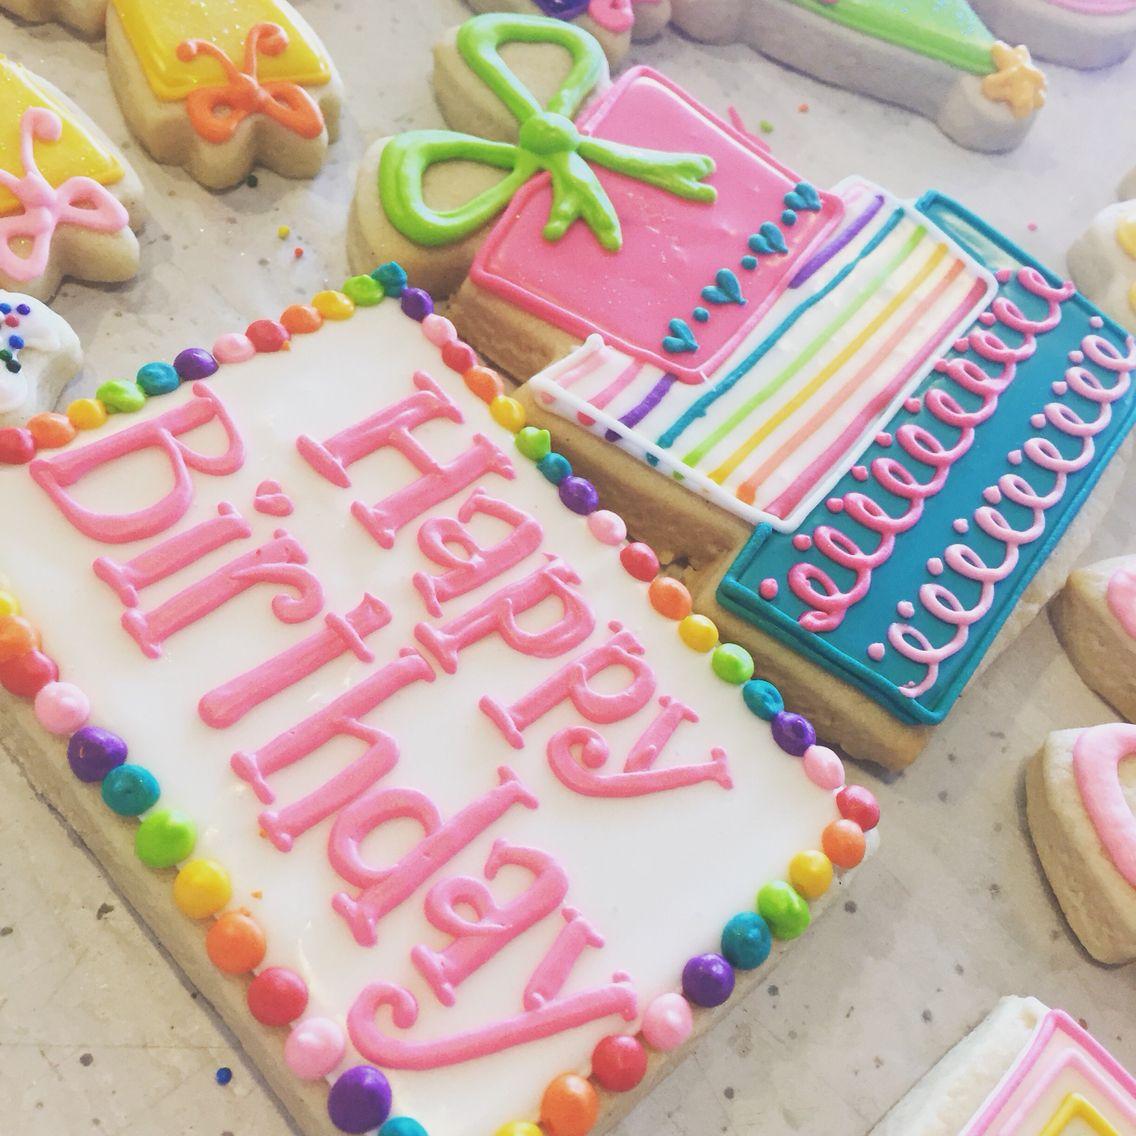 Bright rainbow birthday cookies by Hayleycakes and cookies